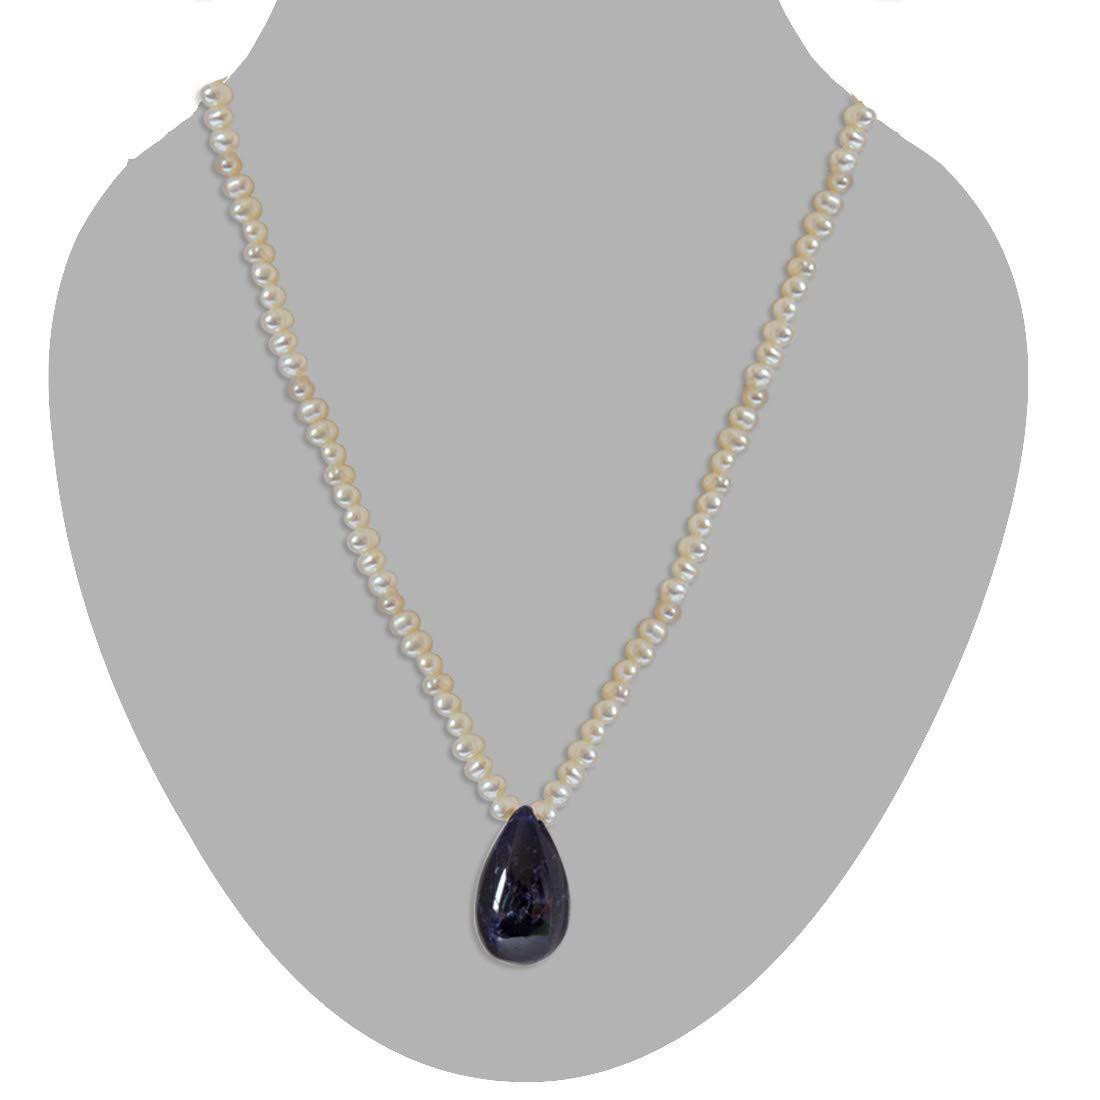 Sapphire Splendor Siren - Real Drop Blue Sapphire & Freshwater Pearl Necklace for Women (SN200)